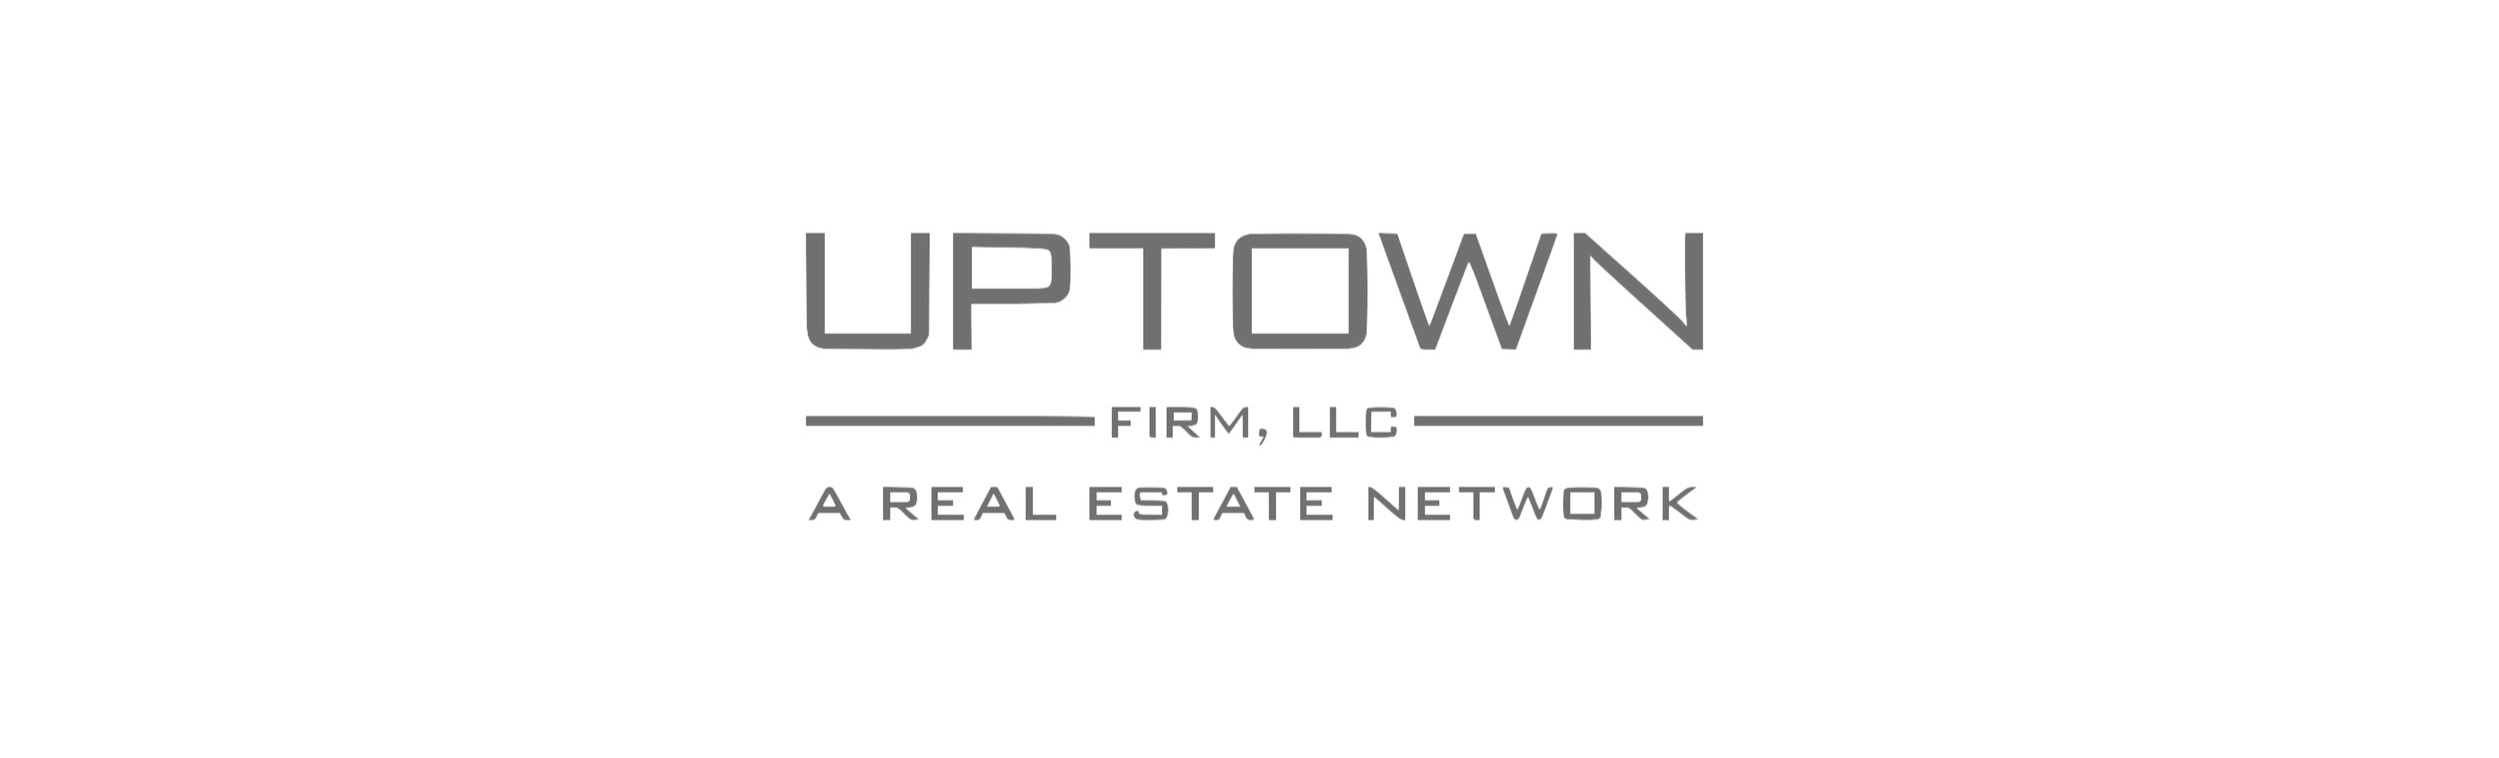 uptown+website.jpg